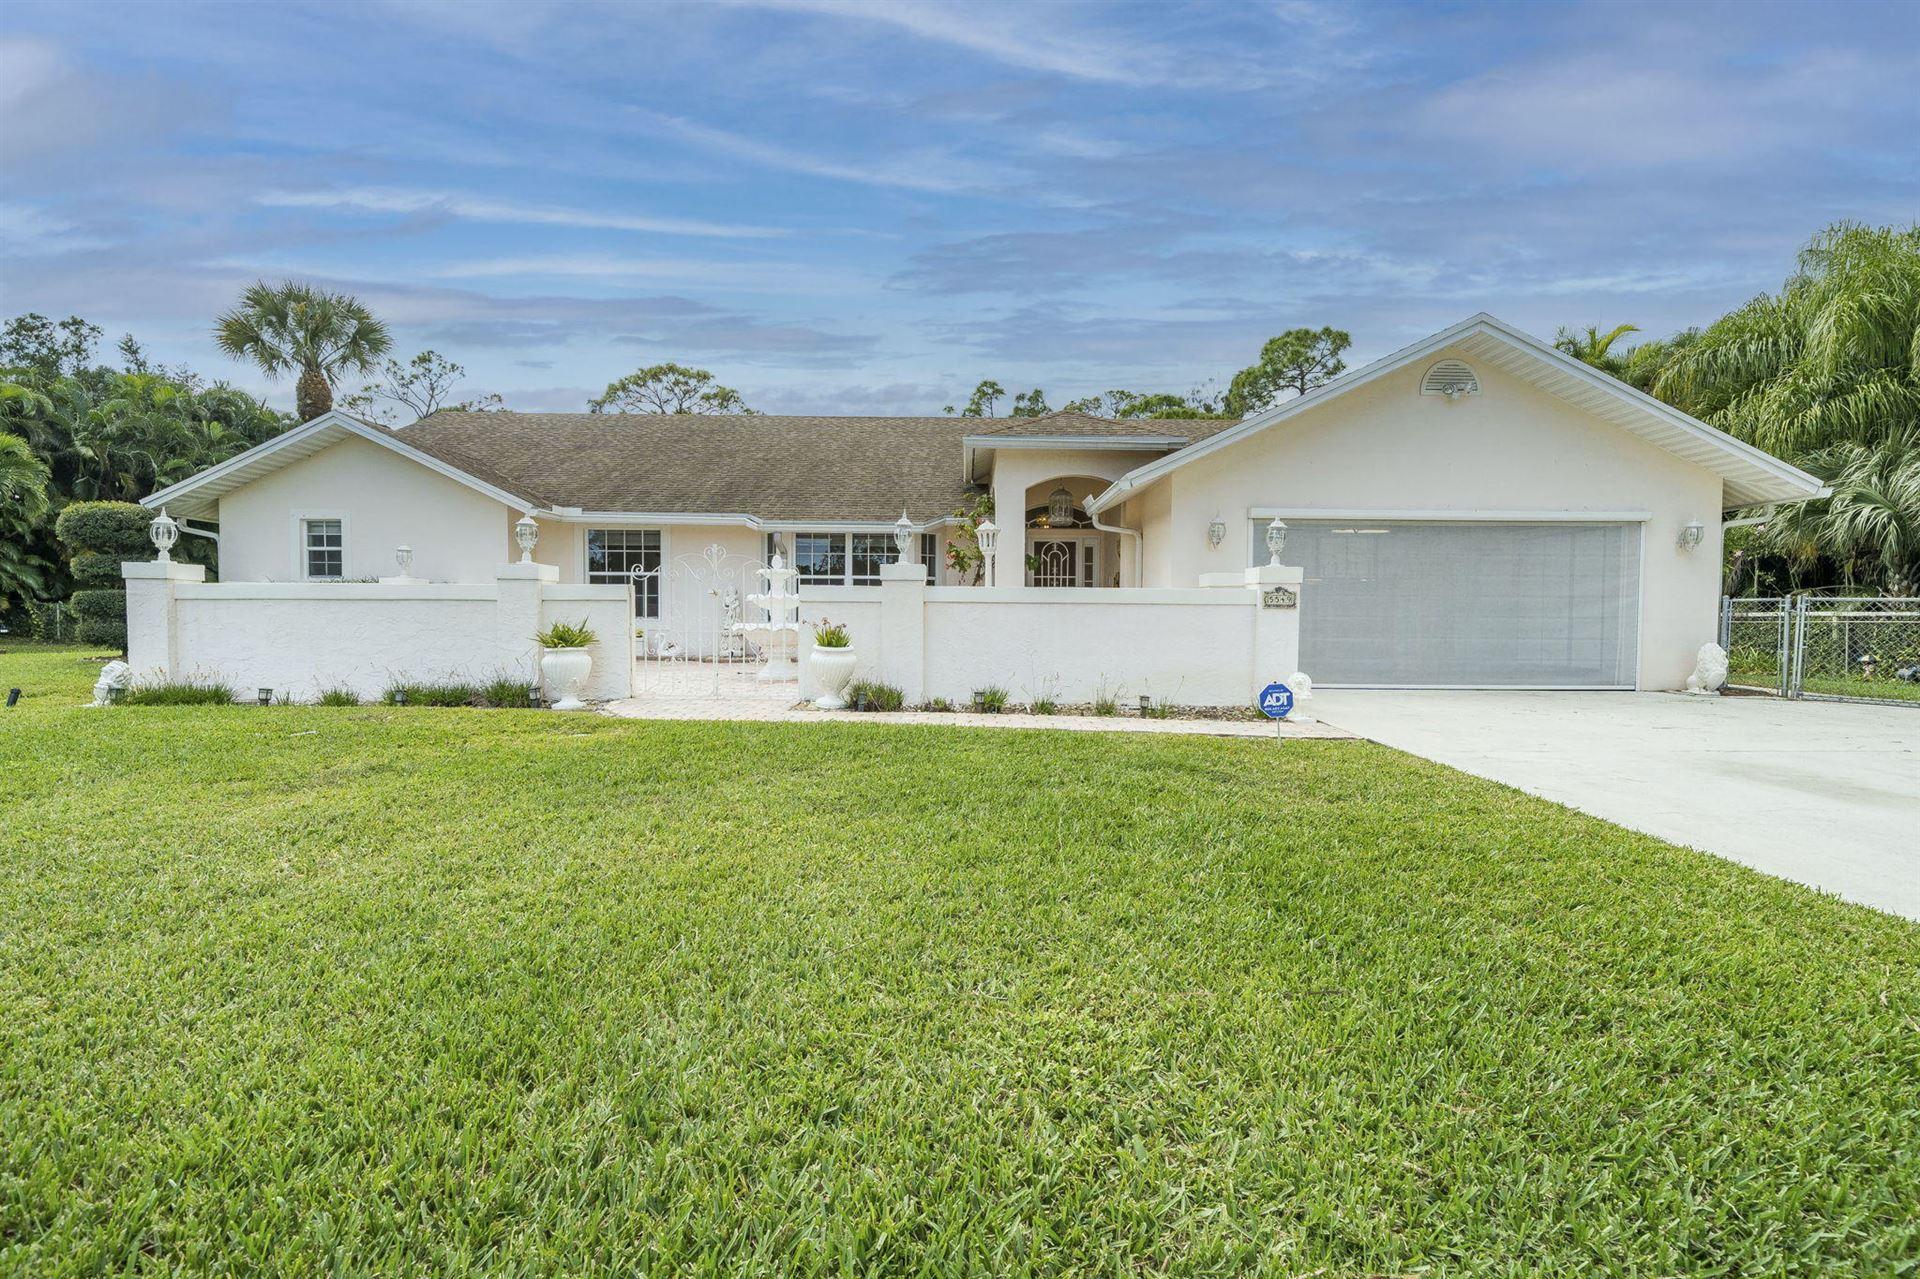 5549 Colbright Road, Lake Worth, FL 33467 - MLS#: RX-10679370